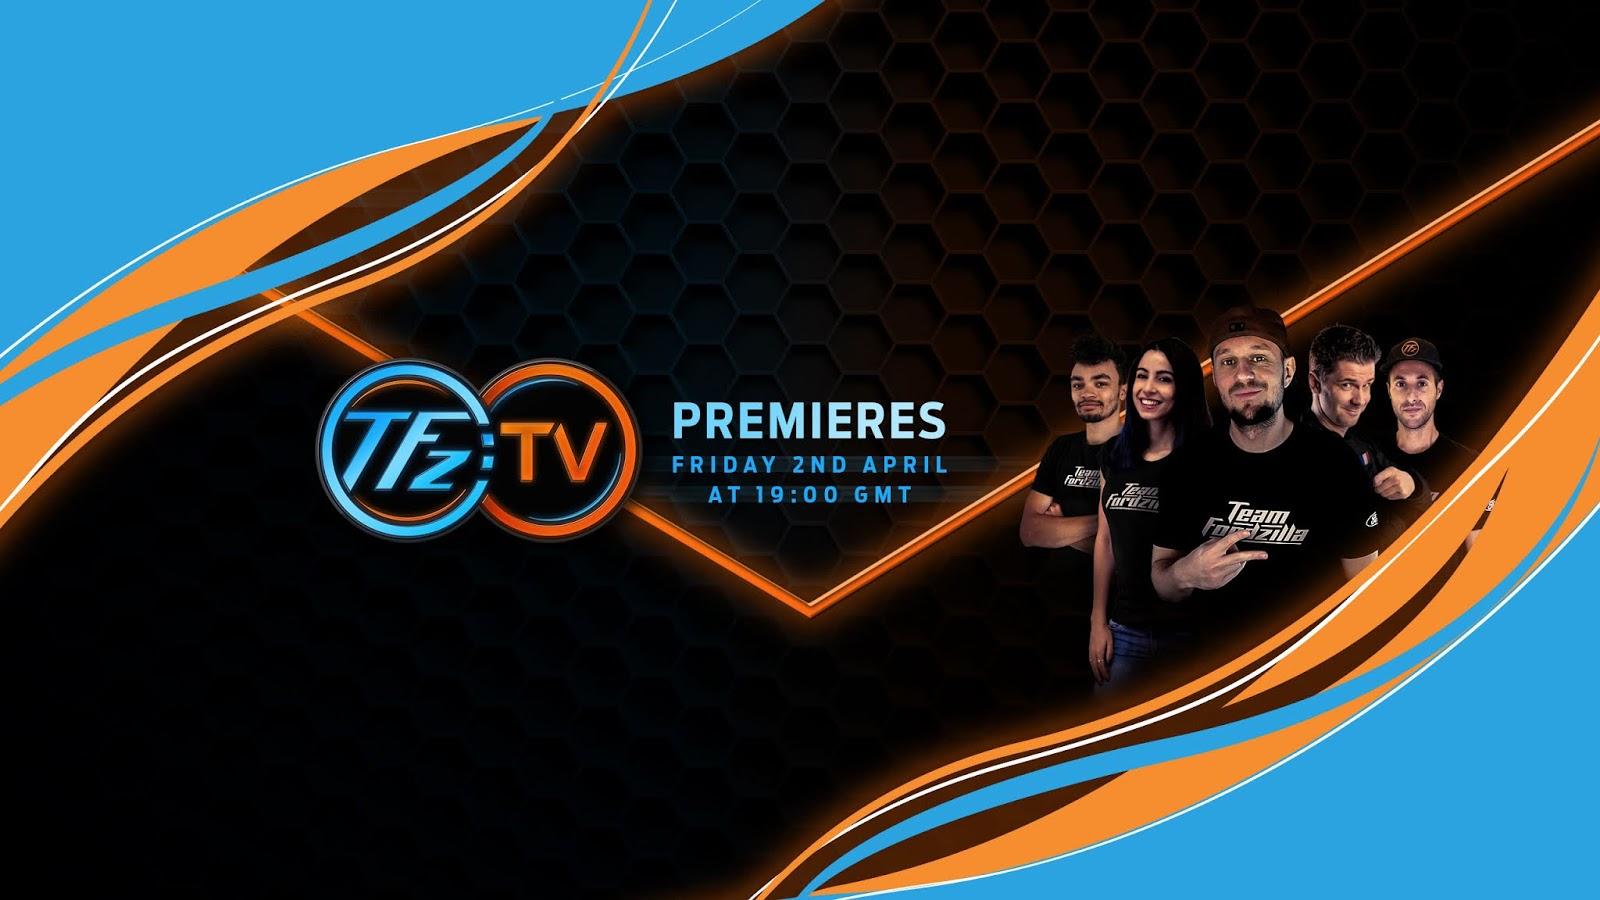 Team Fordzilla TFZ TV 2021 Team Fordzilla : Ζωντανή μετάδοση στο TFZ:TV Twitch Show Ford, Fordzilla, ειδήσεις